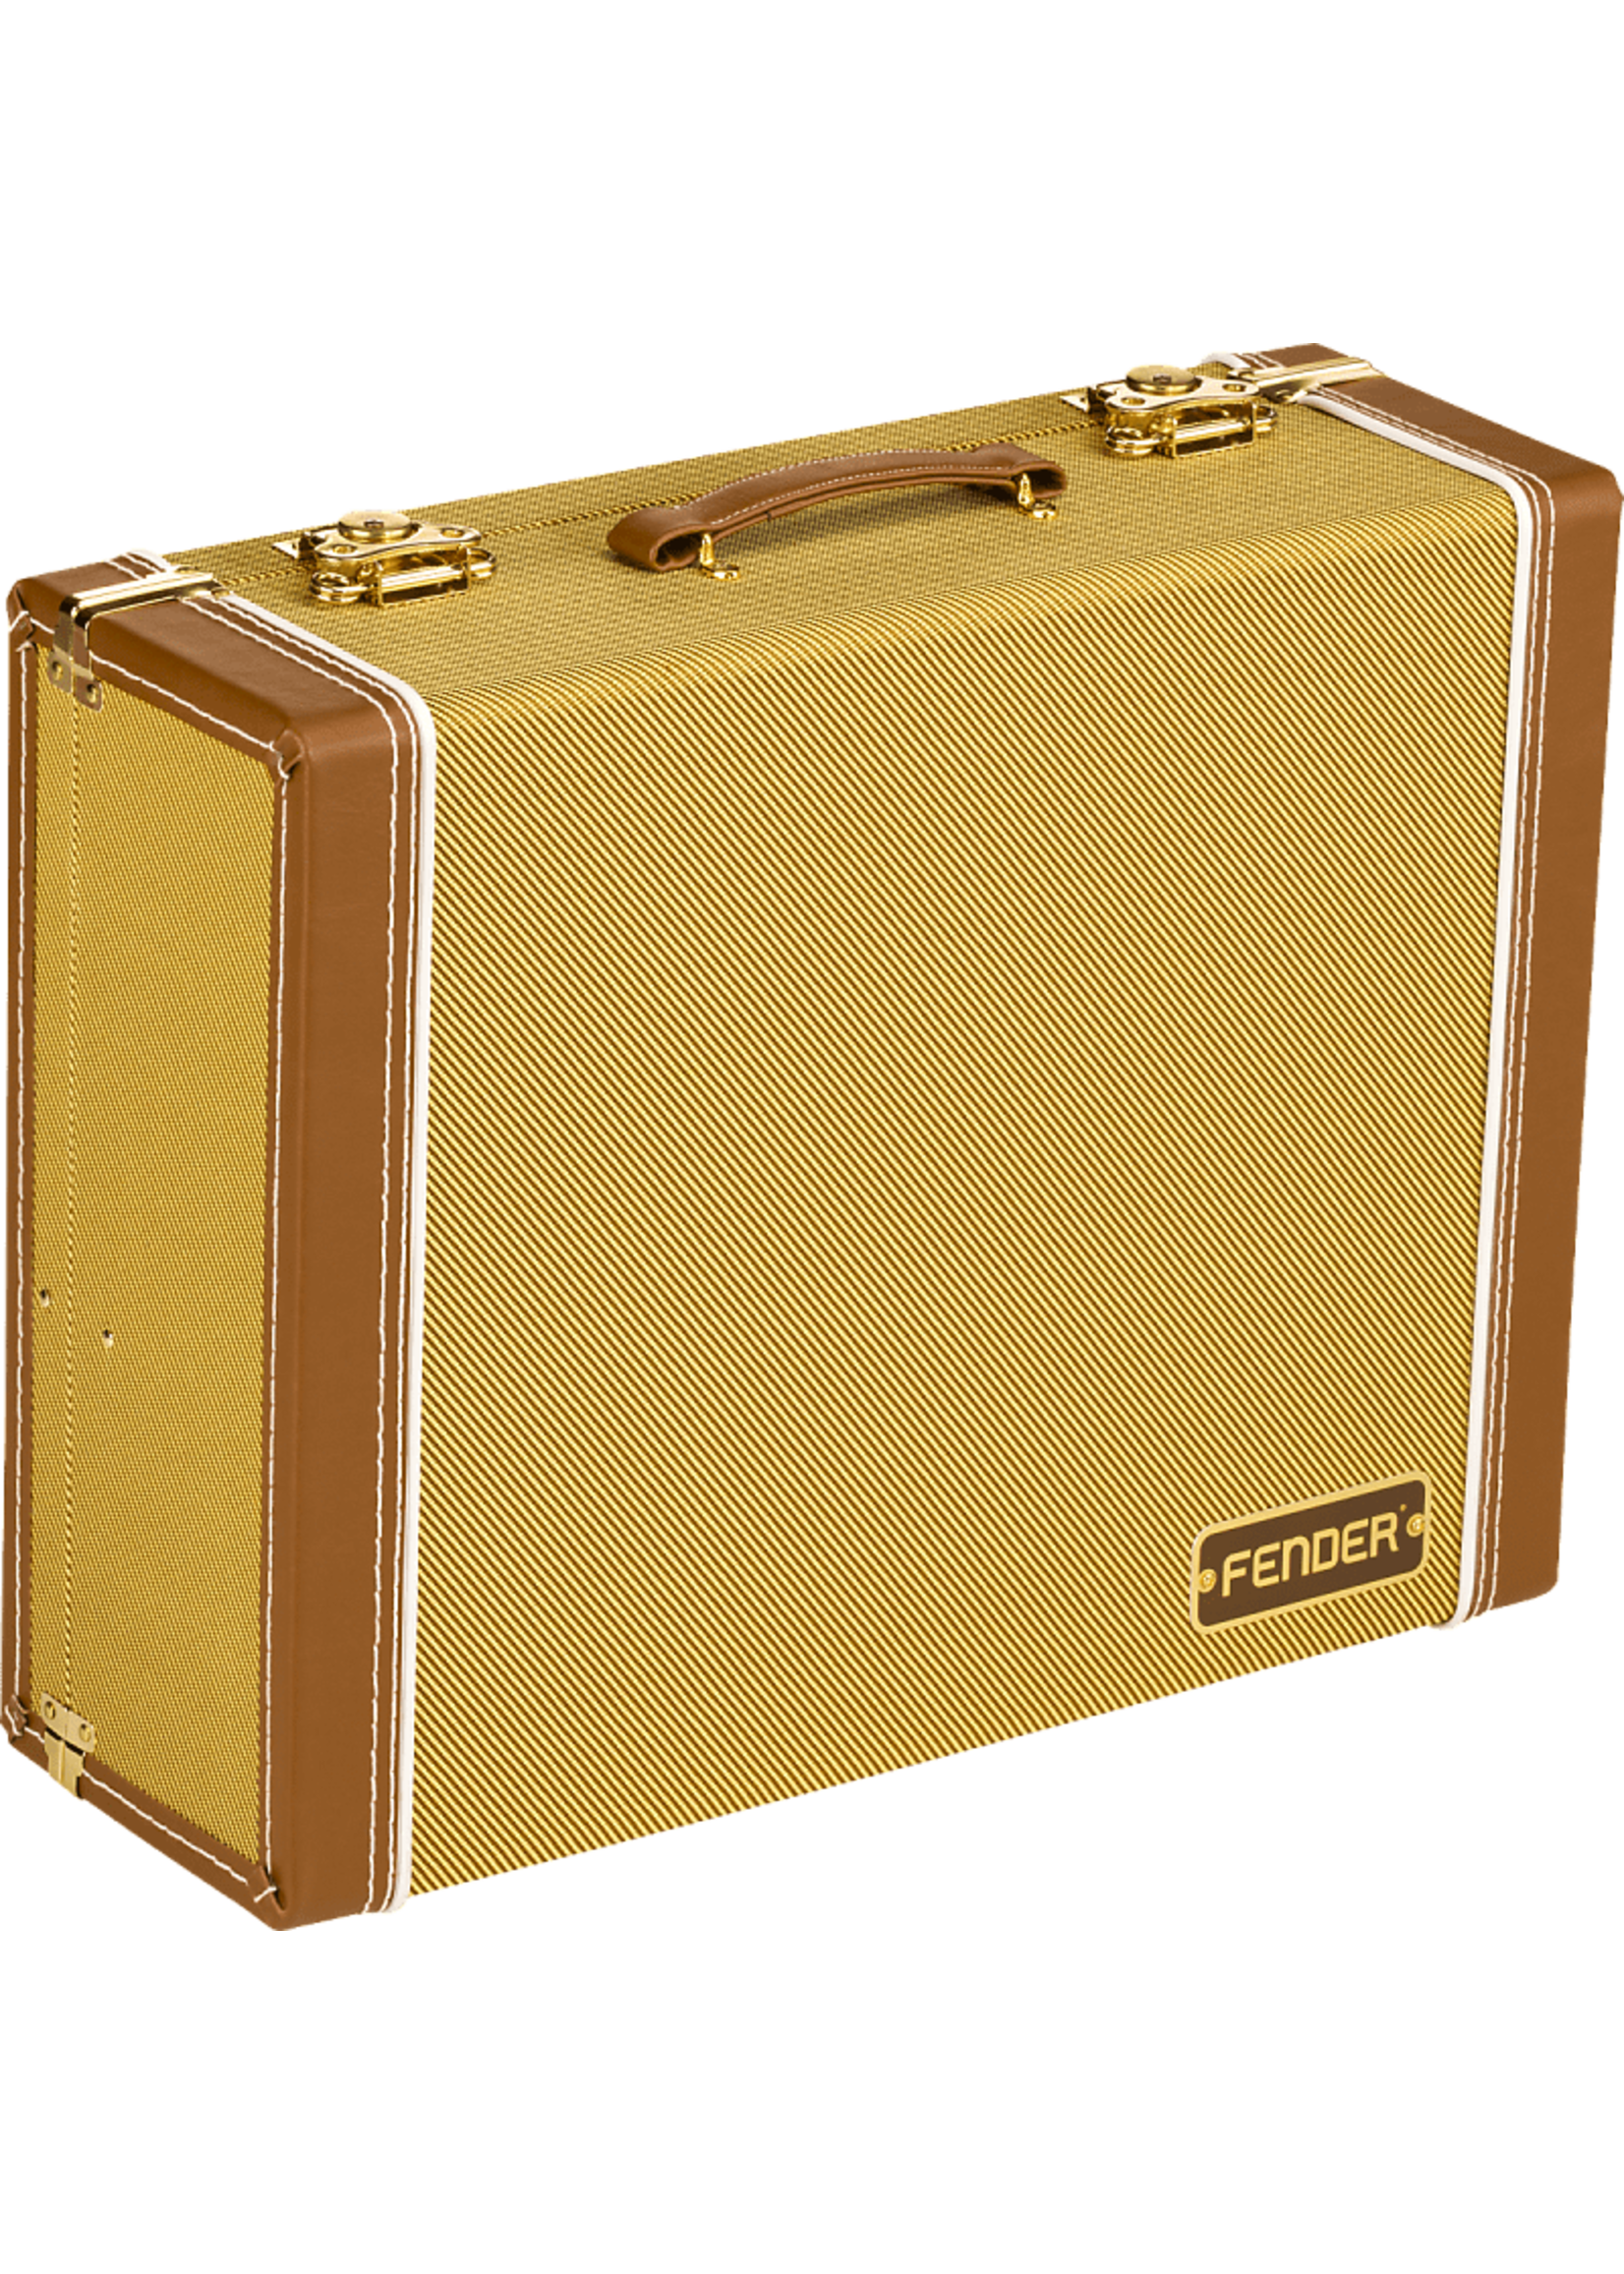 Fender Fender Tweed Pedalboard Case Medium